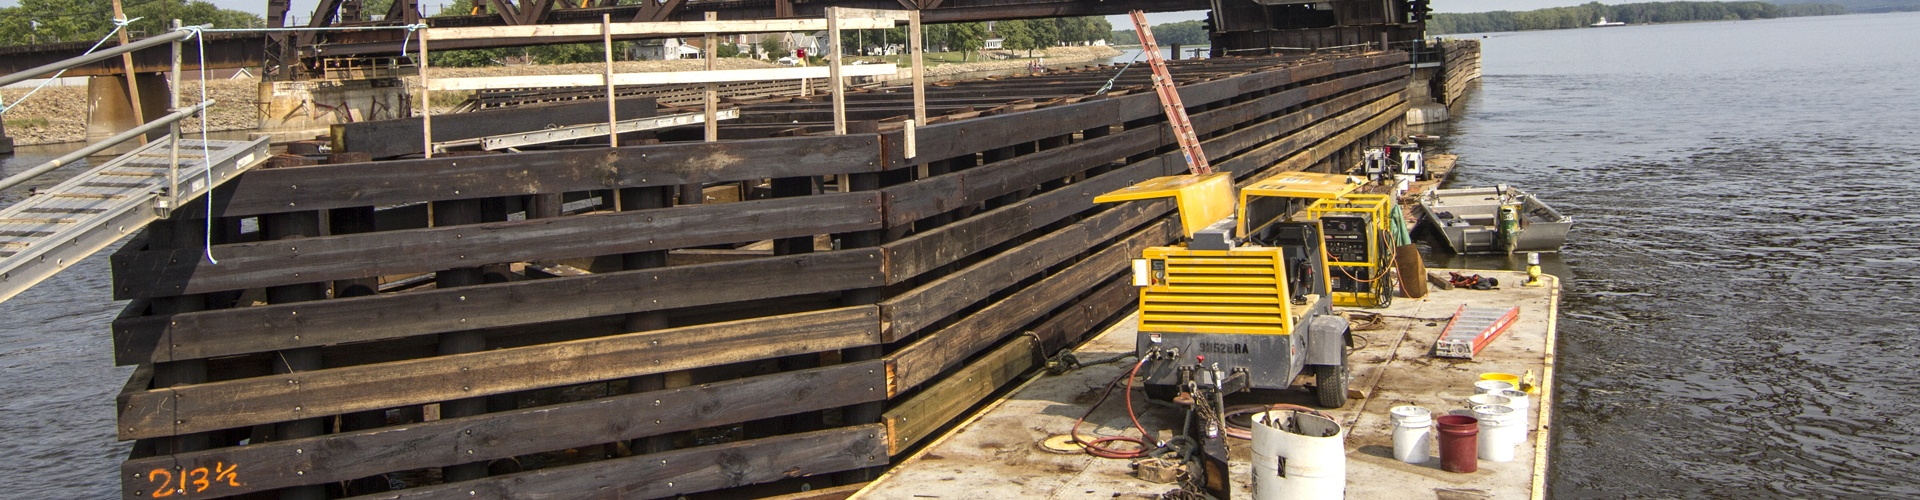 timber cribbing, bridge protection systems, railroad bridge protection, navigation protection